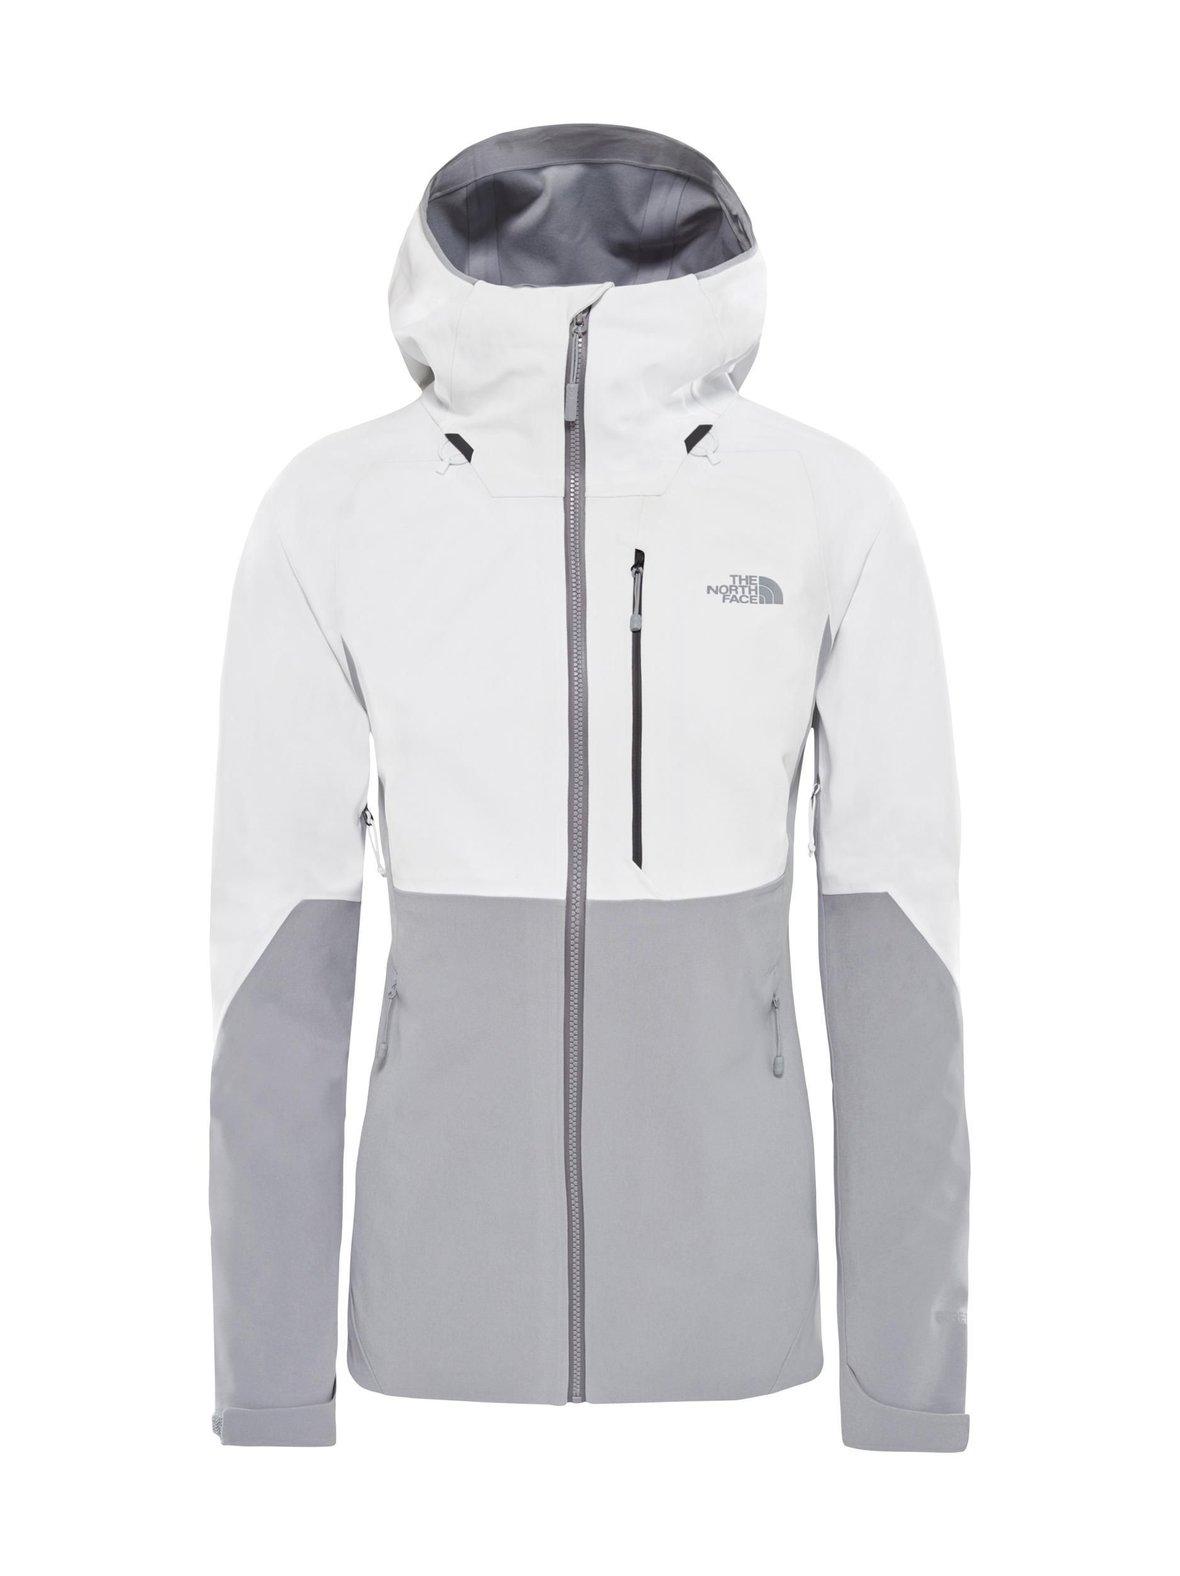 TNF White Mid Grey (valkoinen harmaa) The North Face W s Apex Flex ... ec4a428811